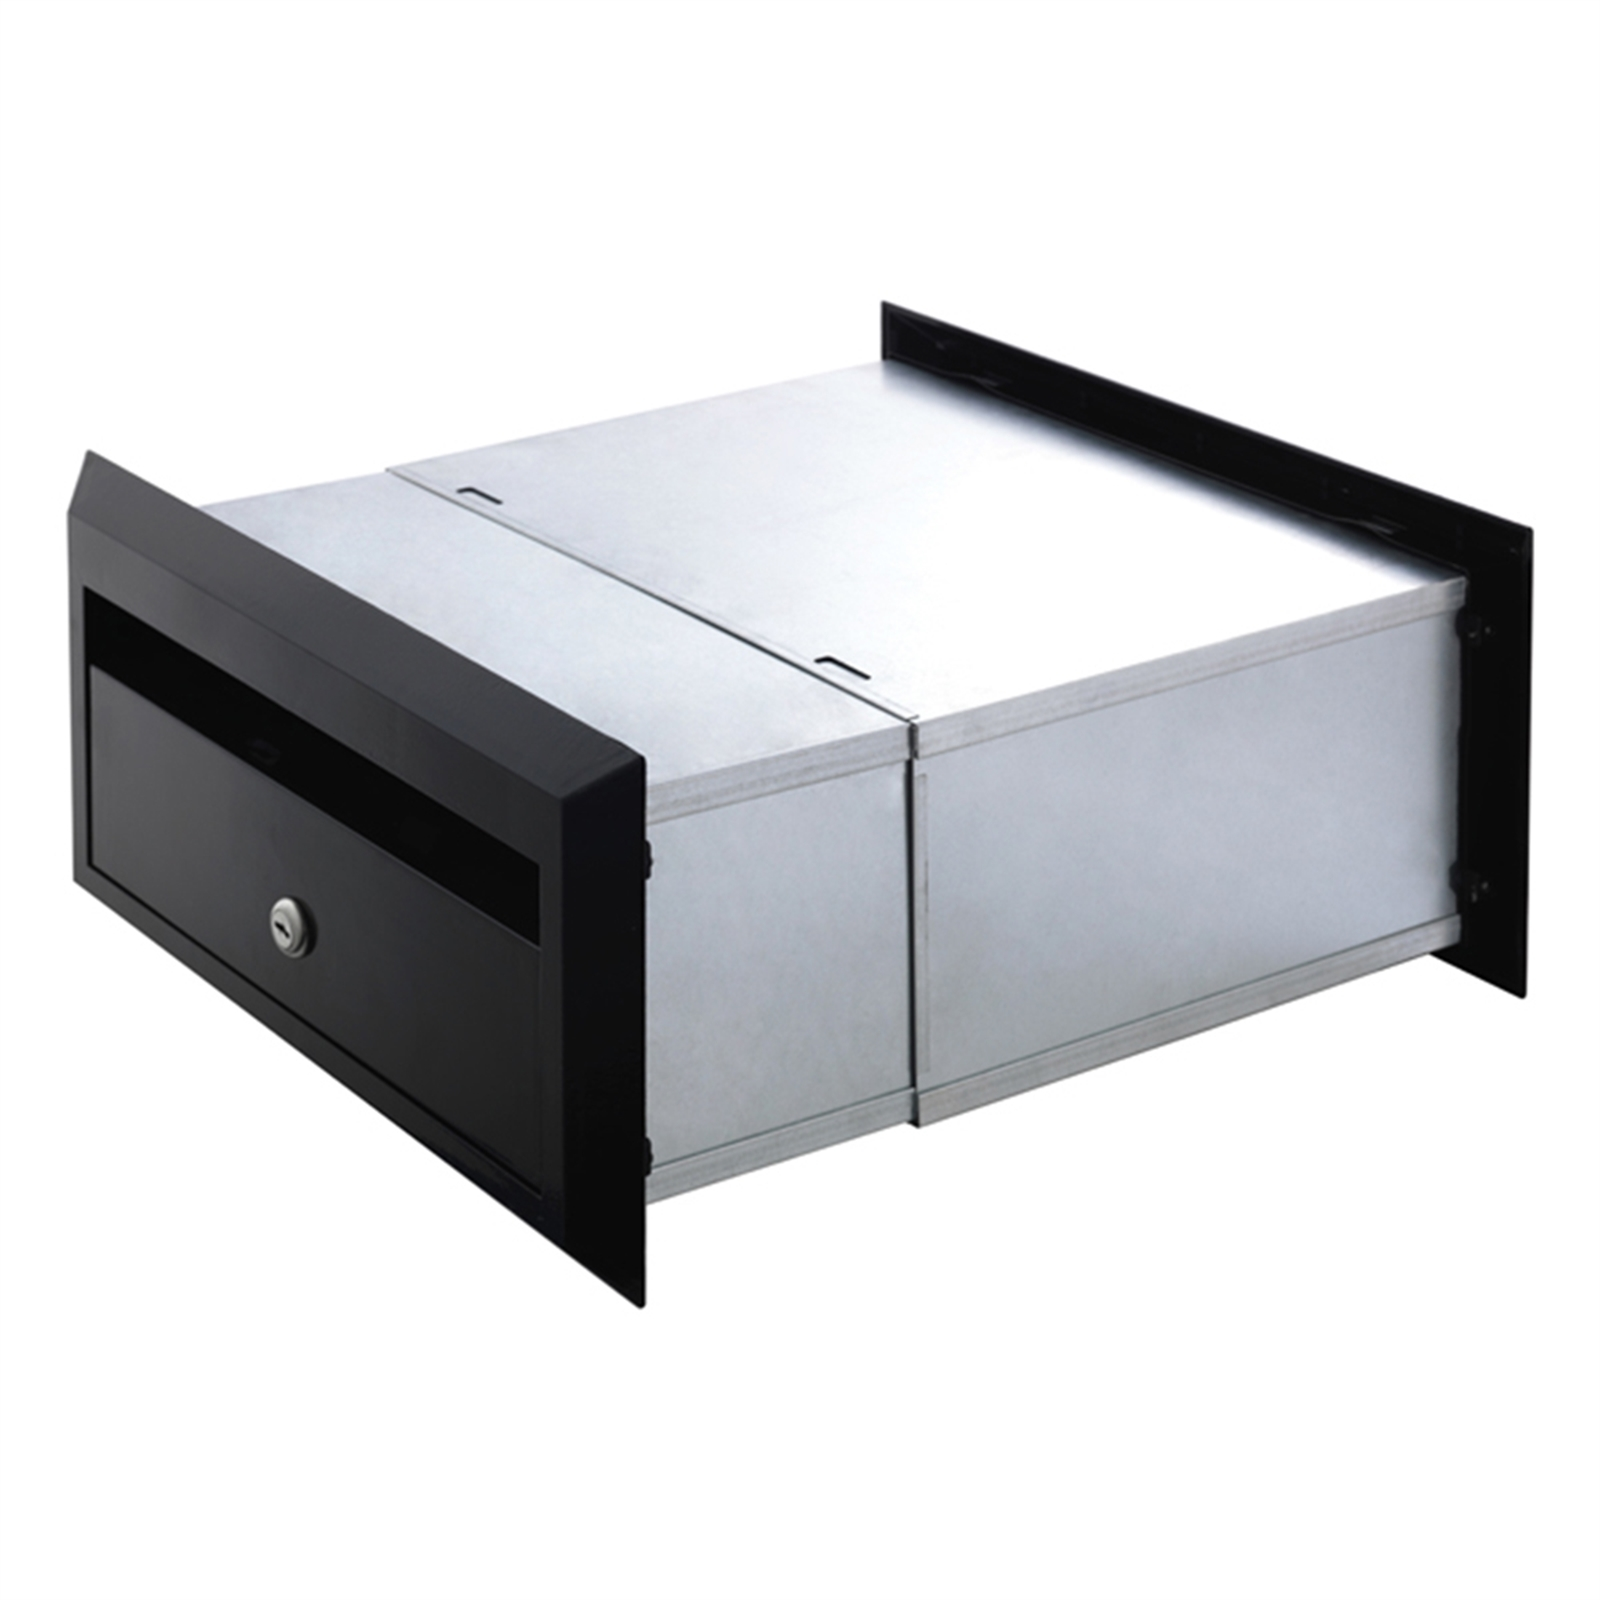 Sandleford 350mm Black Brickies Front Open Letterbox